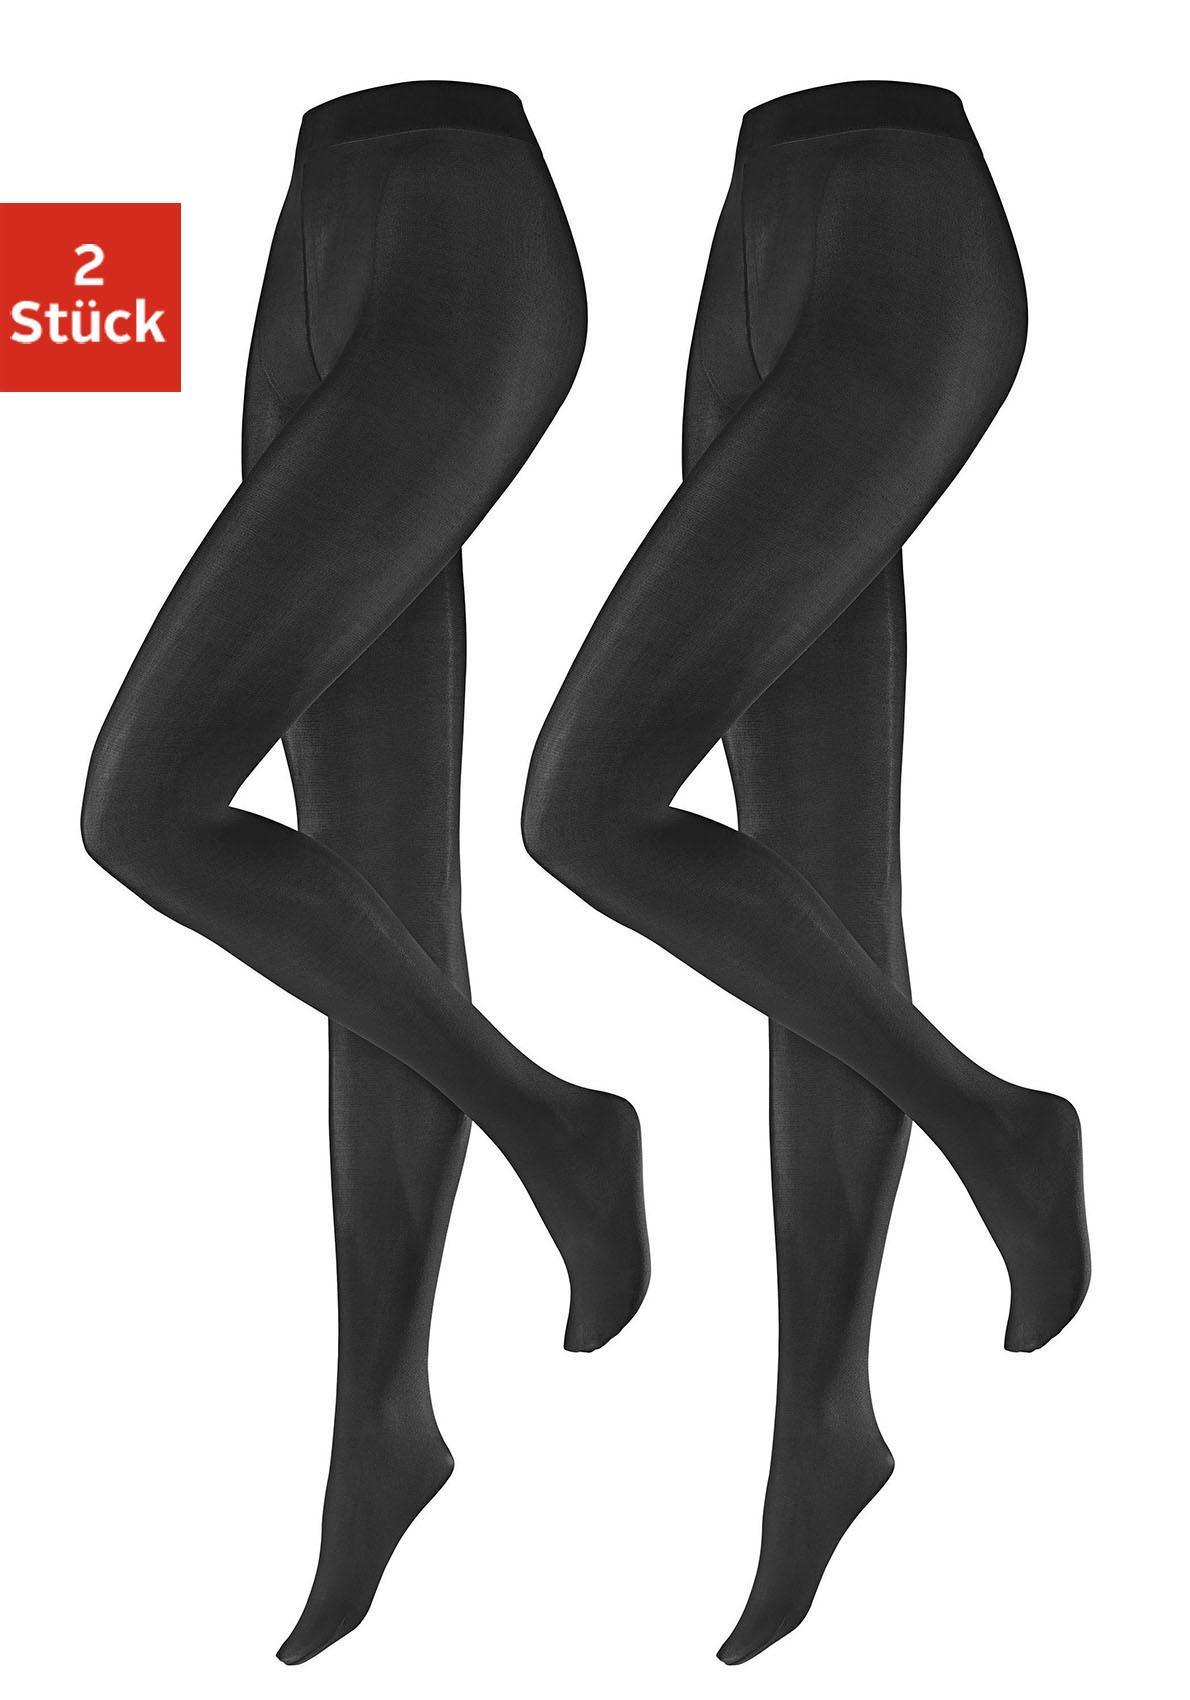 Hudson Feinstrumpfhose, 40 DEN, (2 St.), in DEN mit extrakomfortablem Bund grau Damen Feinstrumpfhosen Strumpfhosen Damenwäsche Feinstrumpfhose